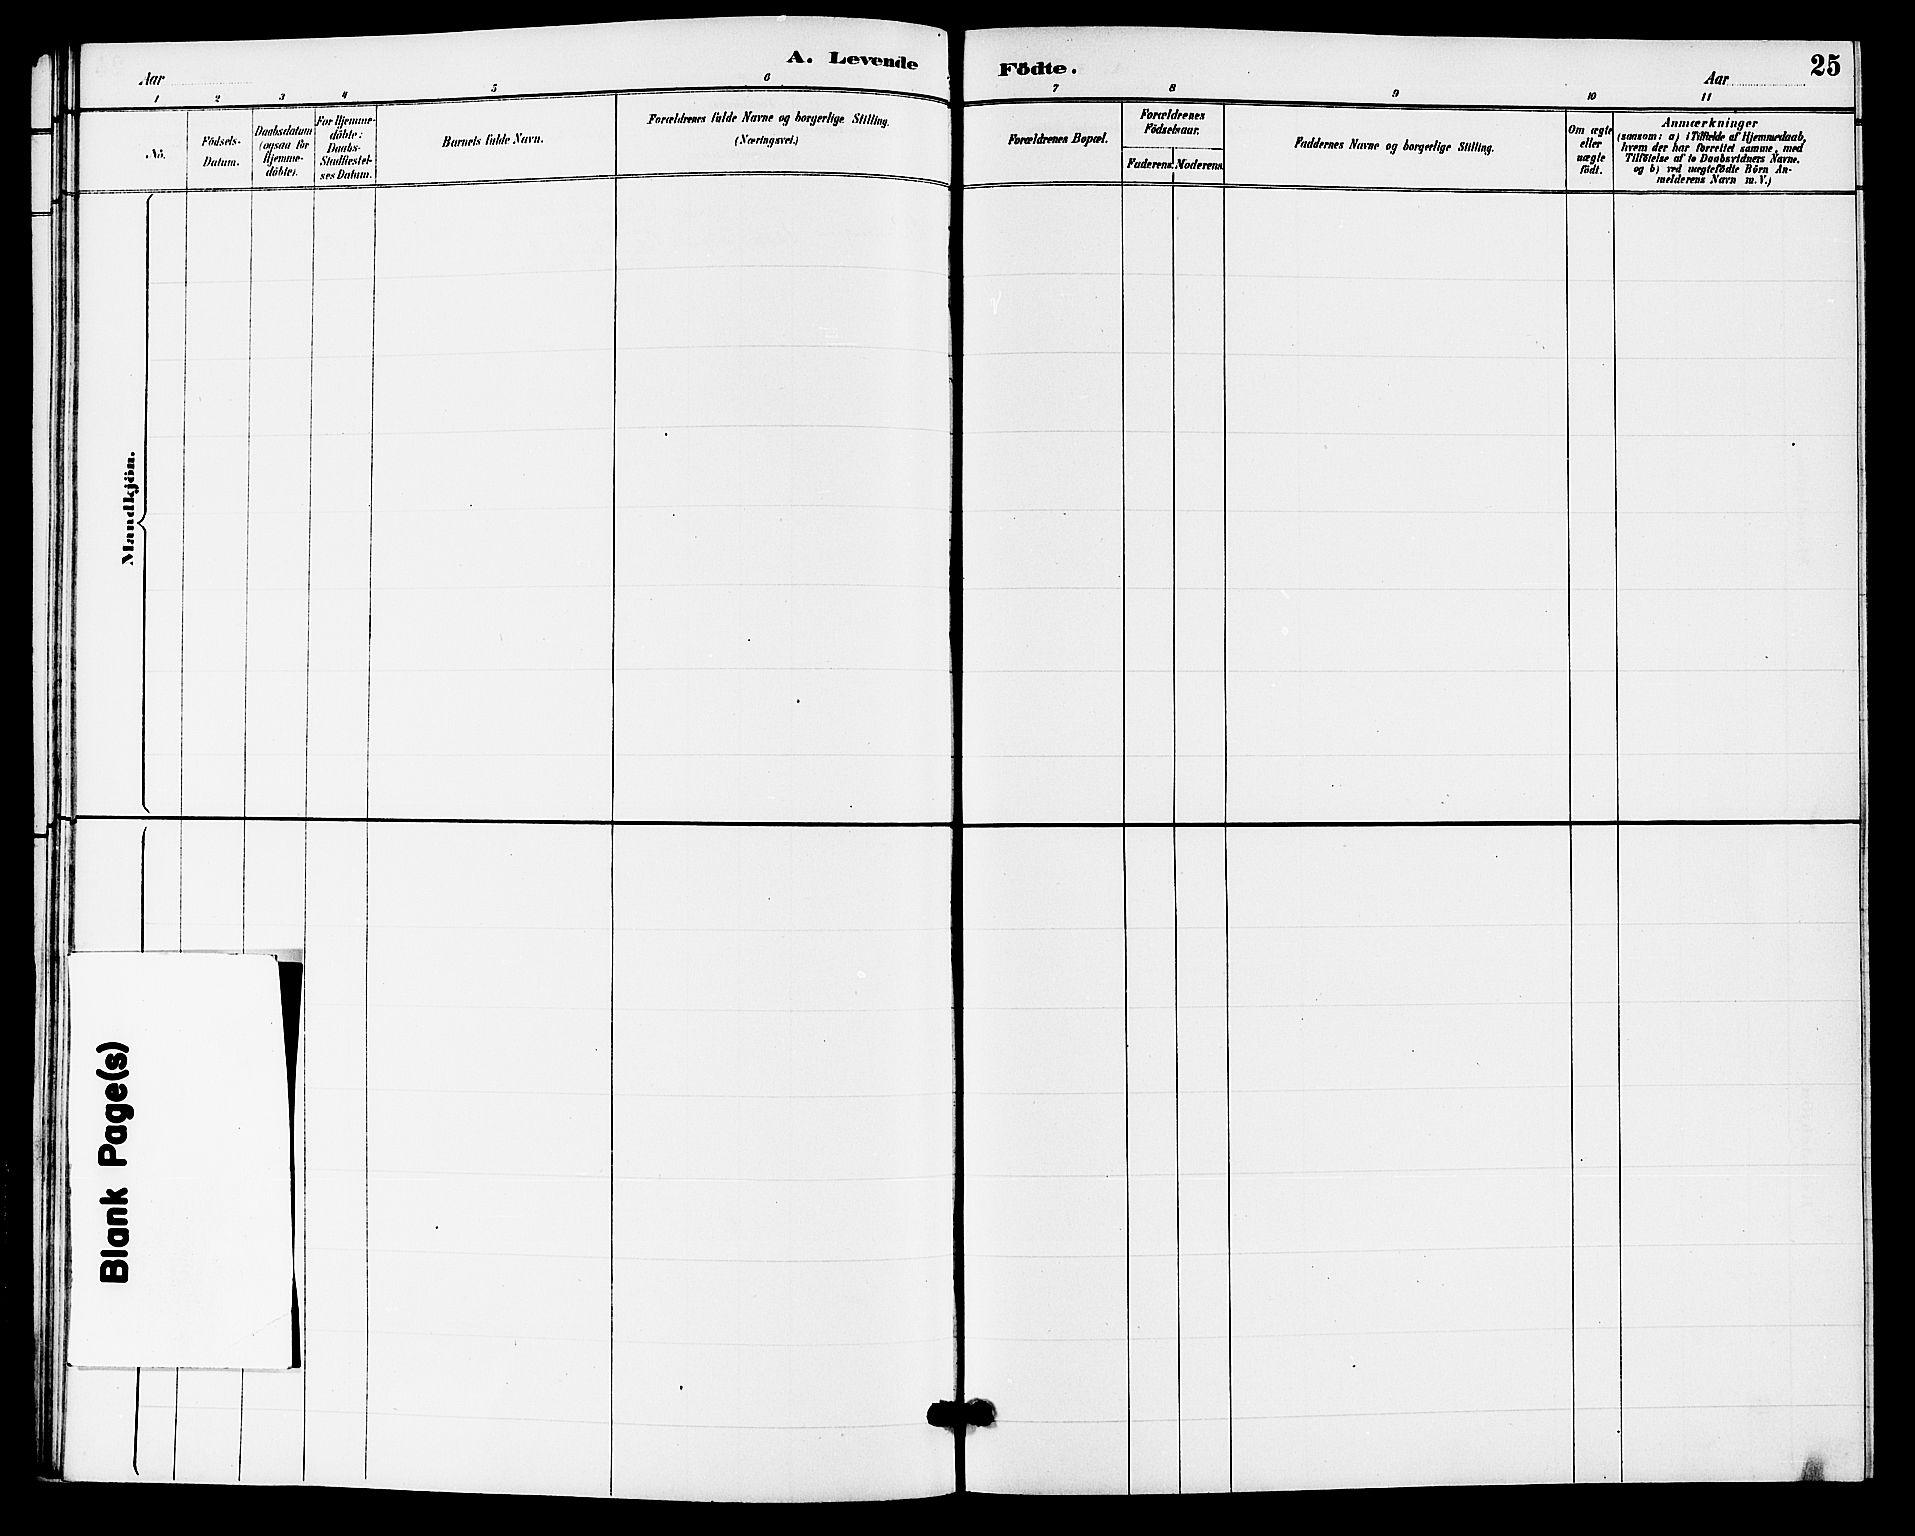 SAKO, Hjartdal kirkebøker, G/Gb/L0003: Klokkerbok nr. II 3, 1884-1899, s. 25